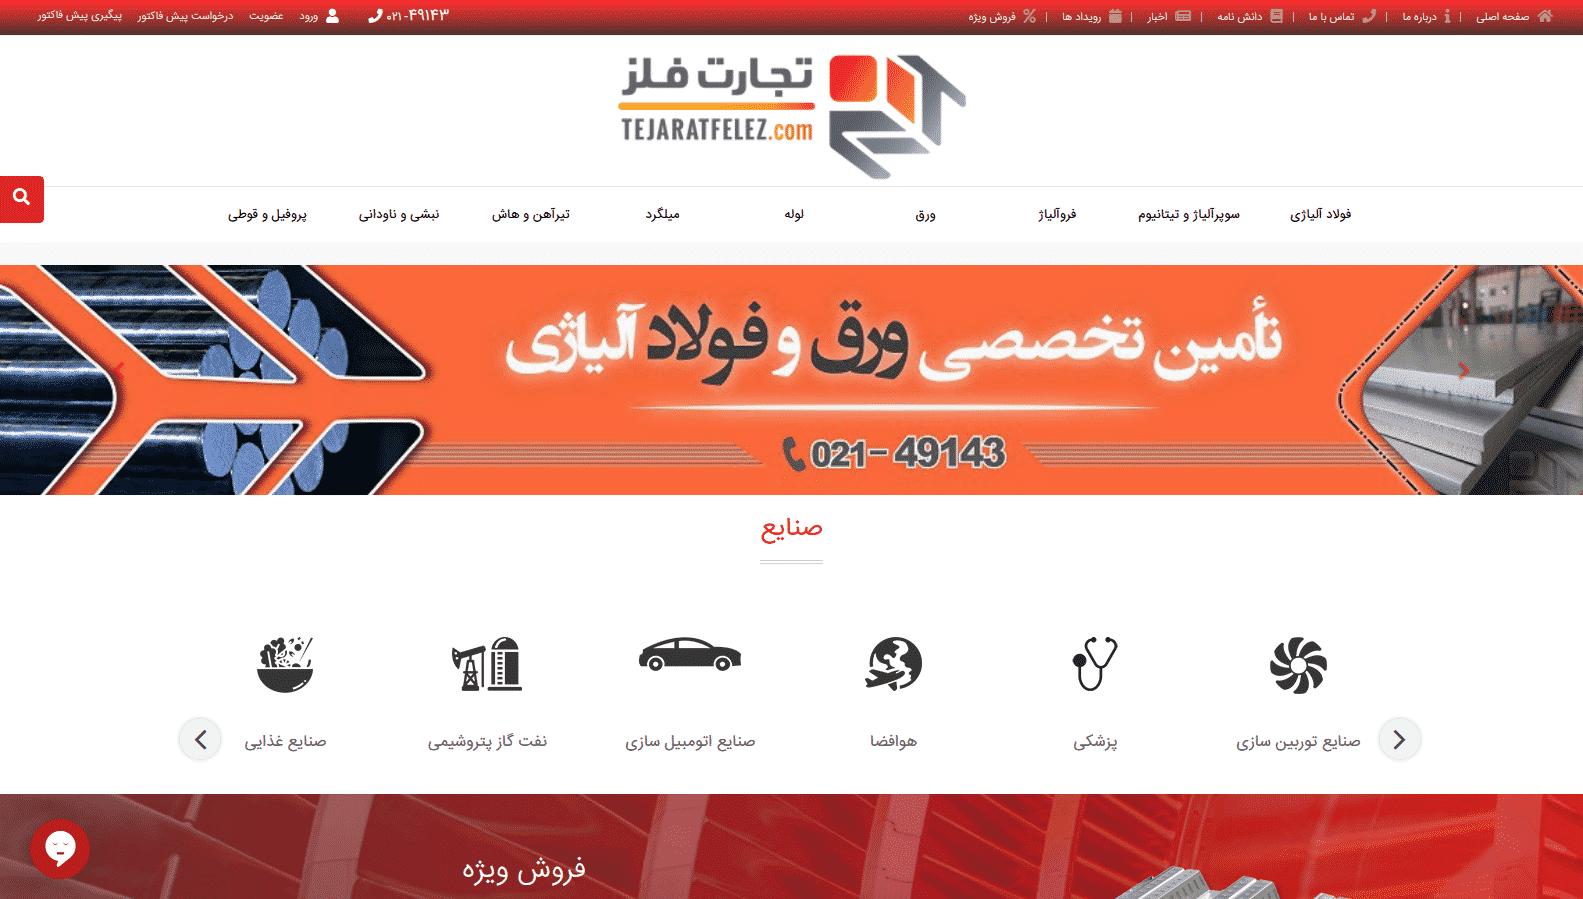 Screenshot_2020-11-22 تجارت فلز - تامین فلزات صنایع - 49143 - 021